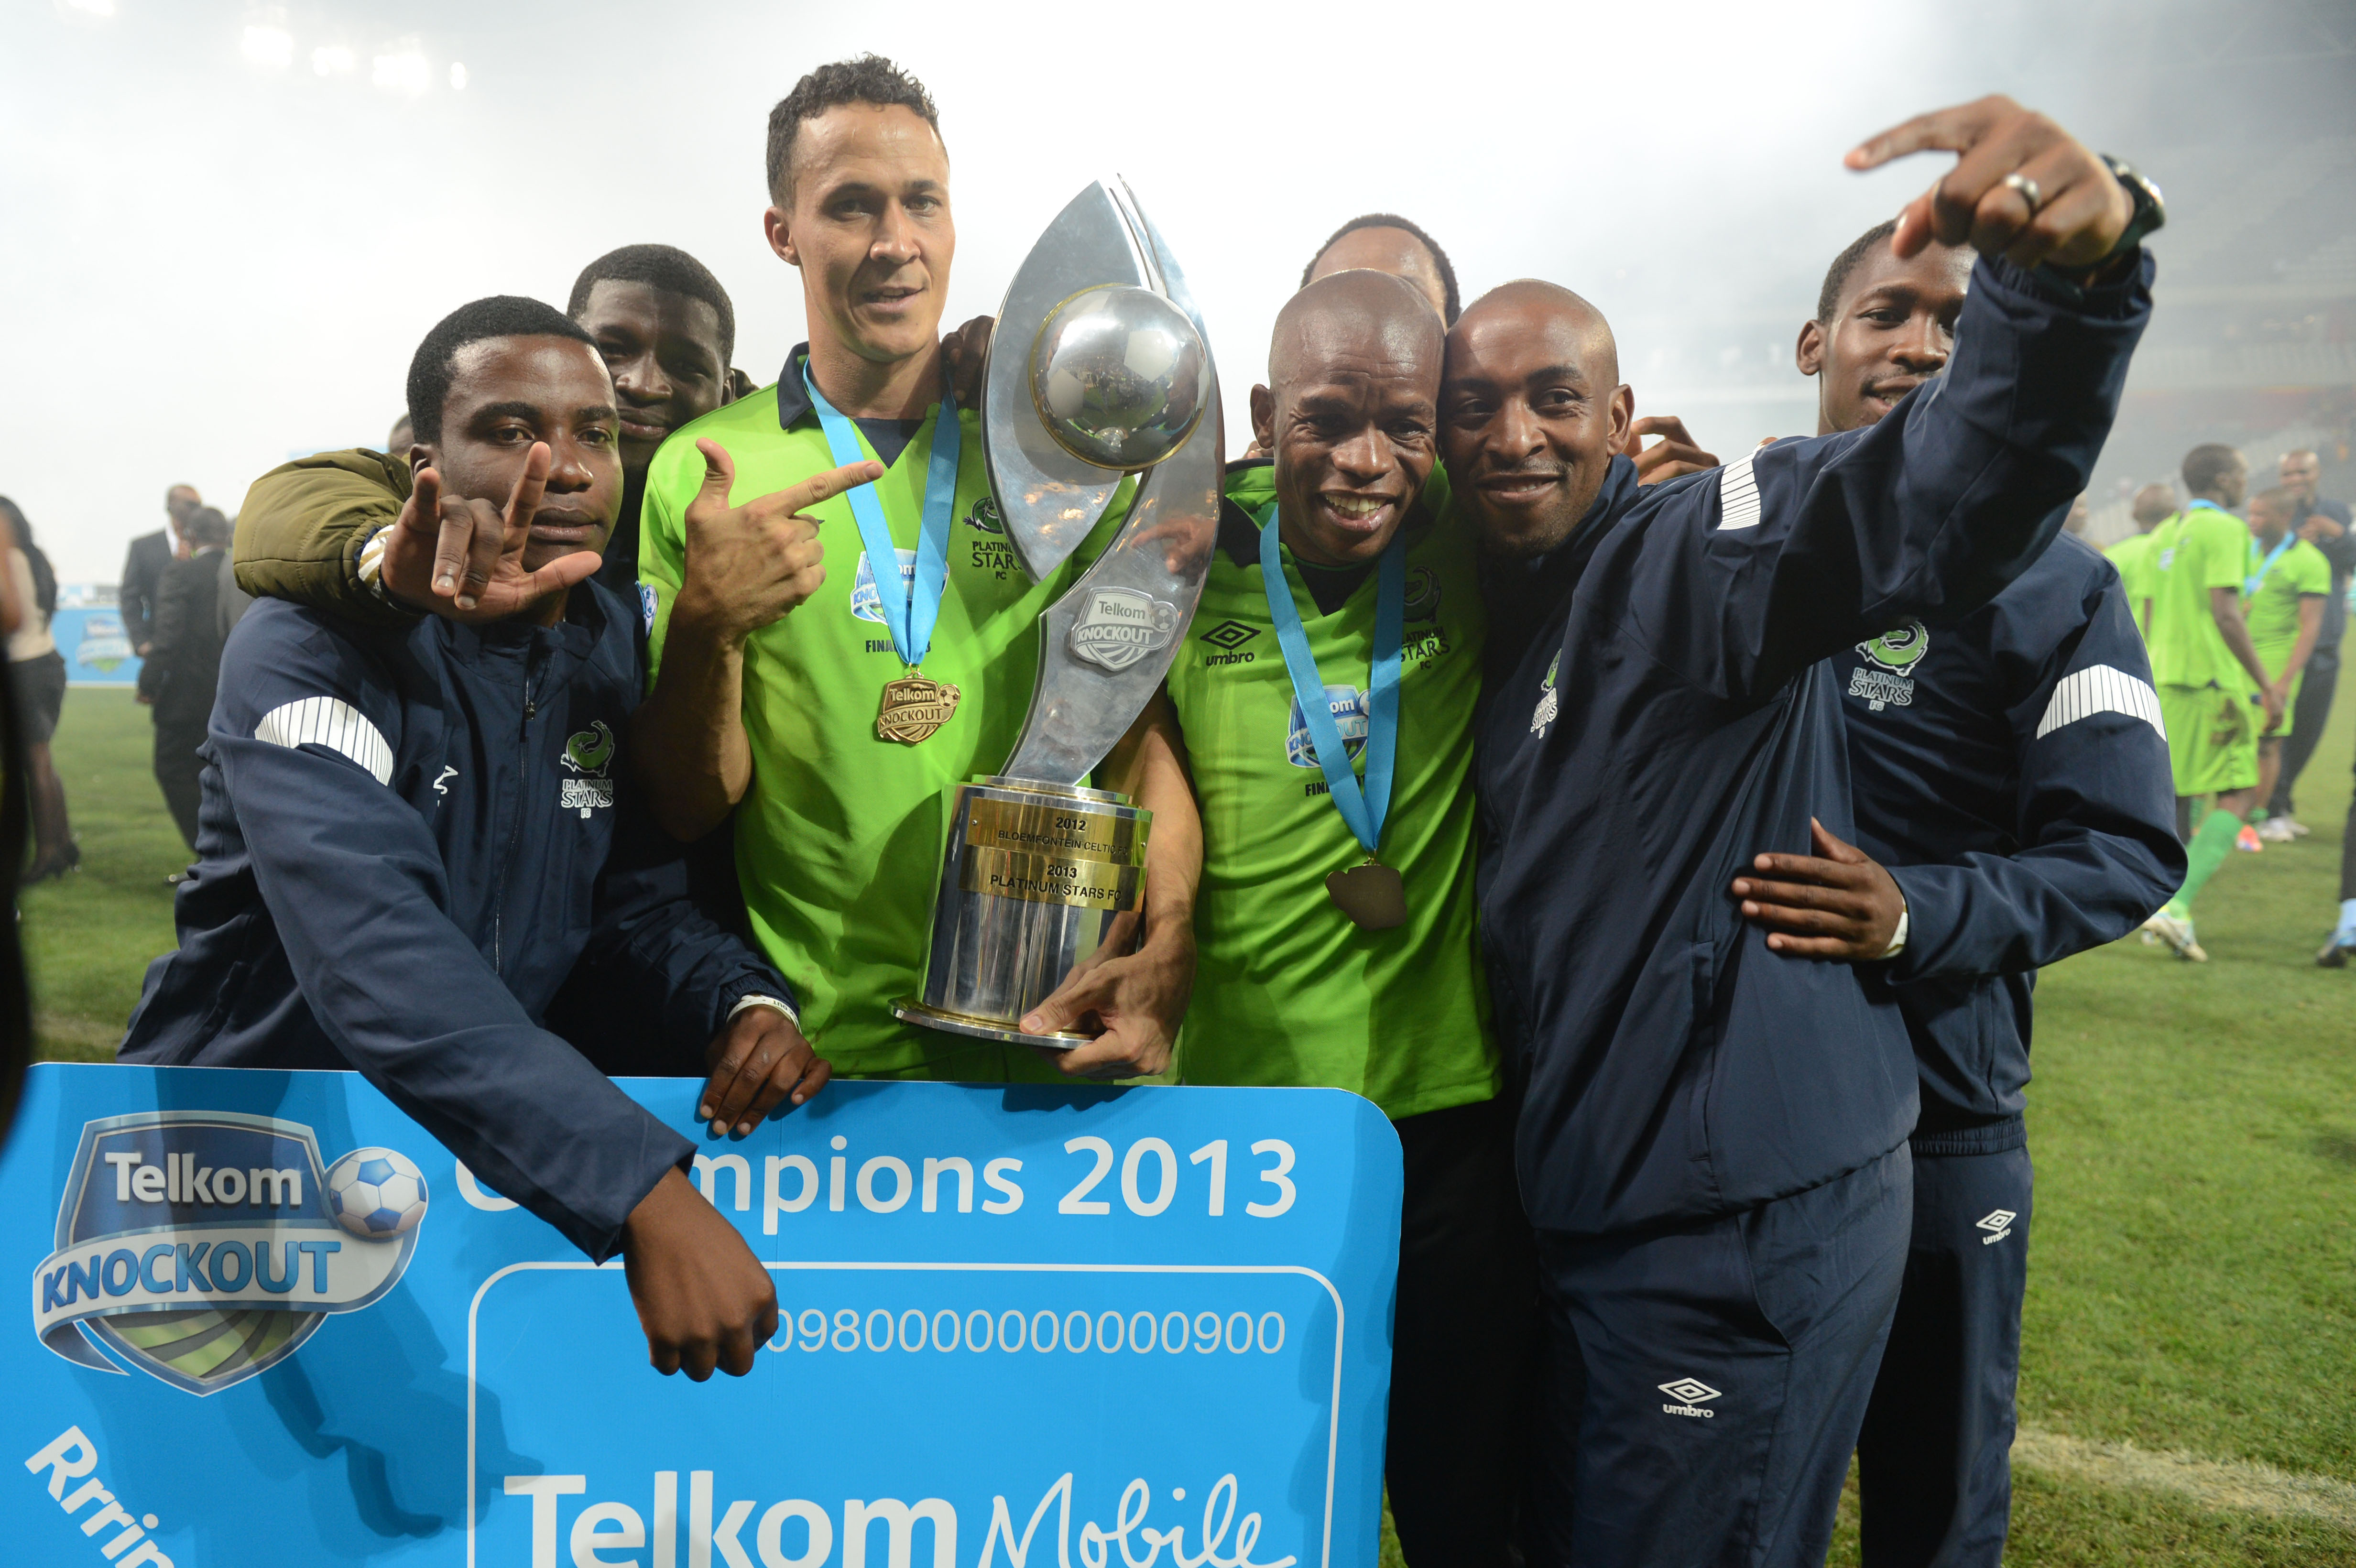 Platinum Stars Telkom Knockout champs 2013